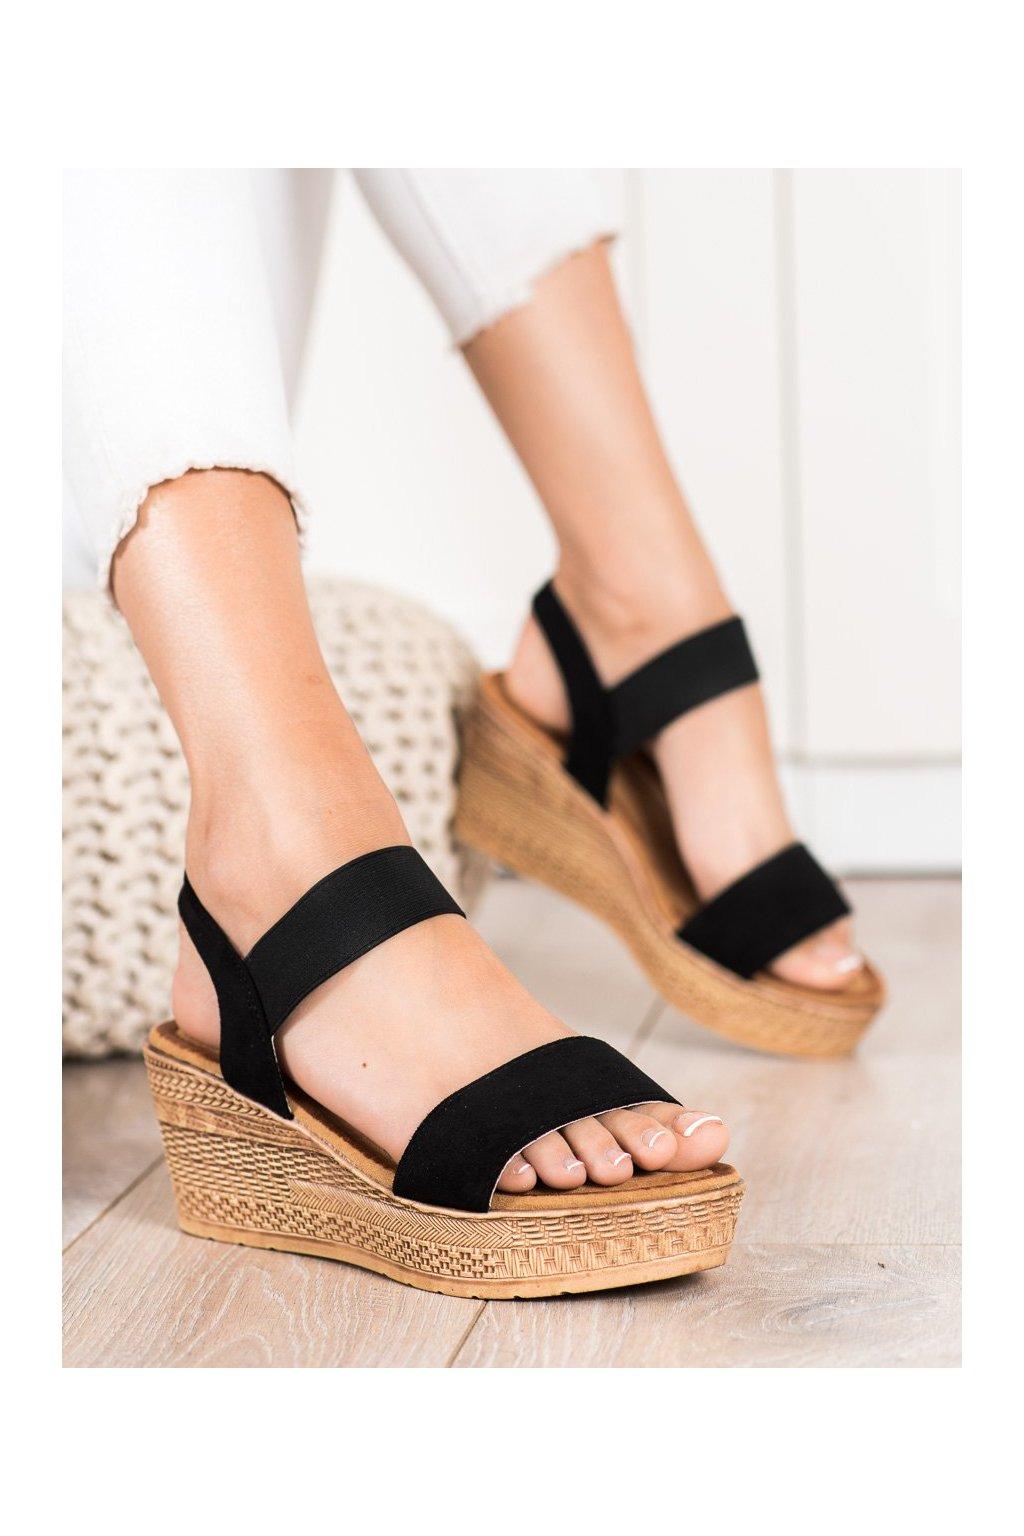 Čierne dámske sandále Queentina kod BH2606B